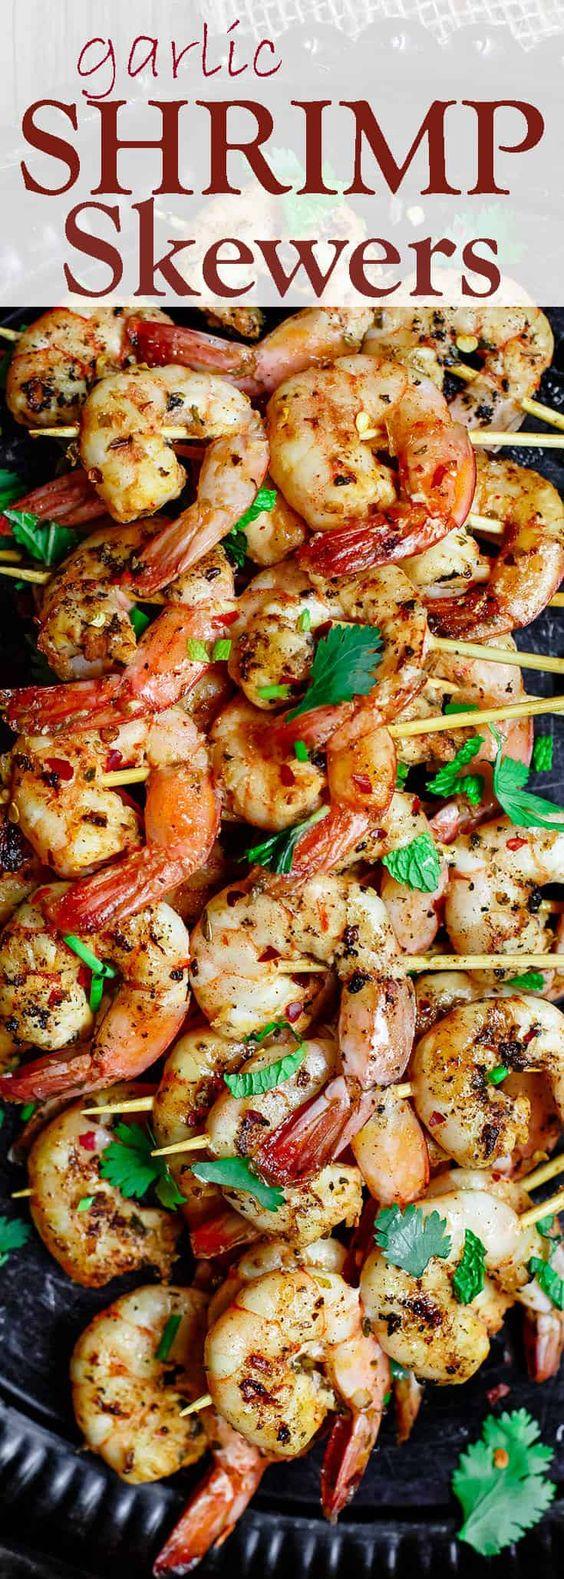 image © the Mediterranean dish |